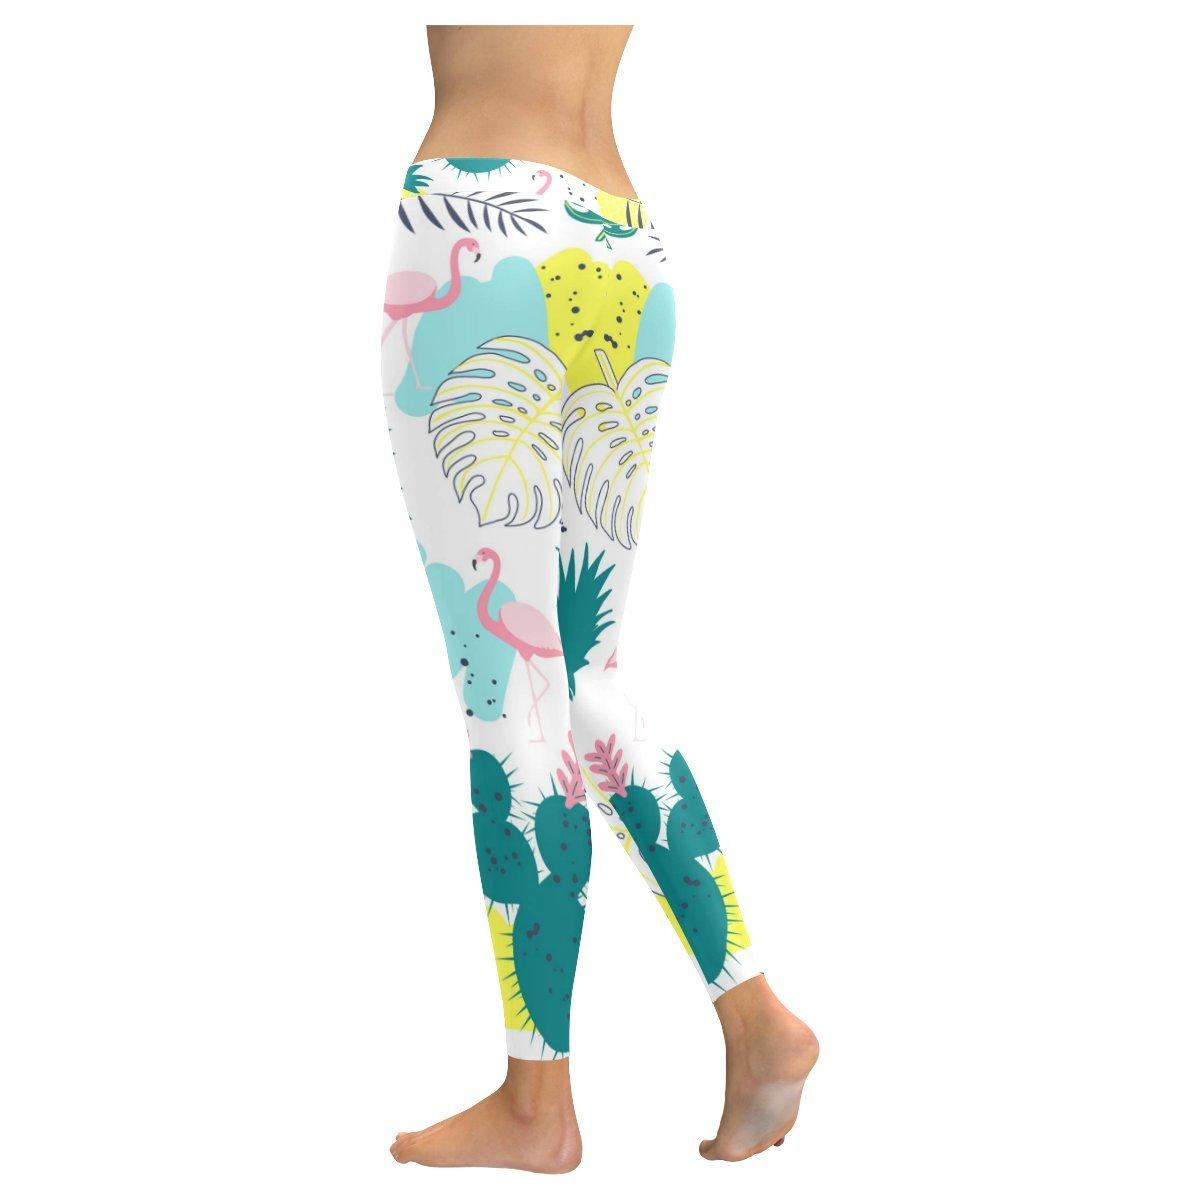 ea7605466bb266 Clothing Custom Tropical Flamingo Skinny Leggings Stretchy Capri Pants for Yoga  Workout Pilates Gym,2XS-5XL